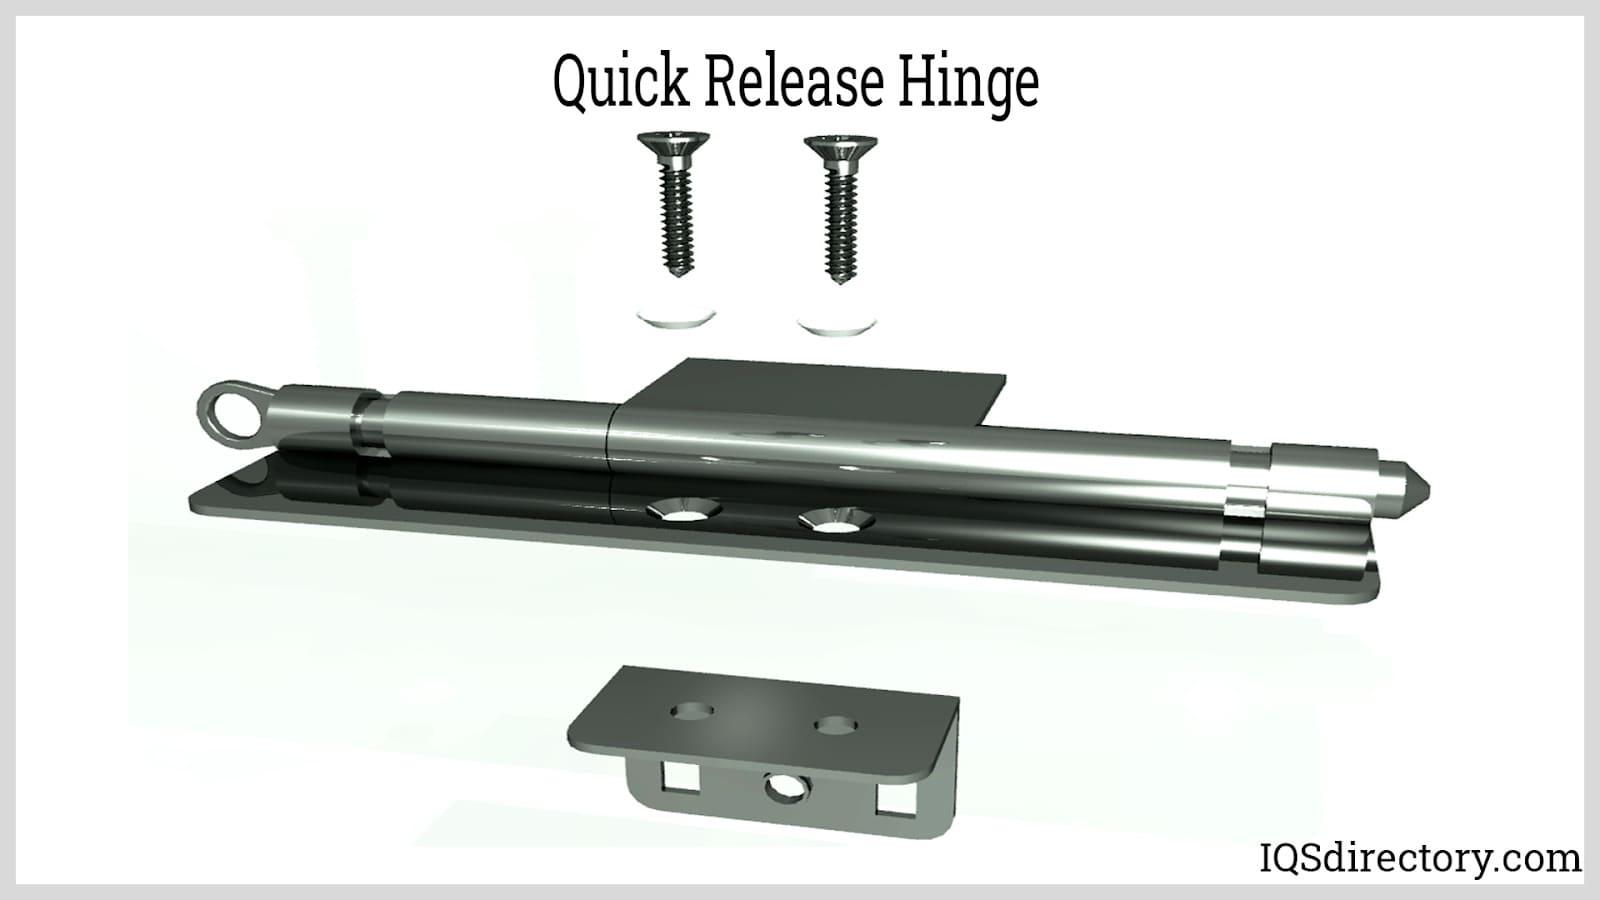 Quick Release Hinge